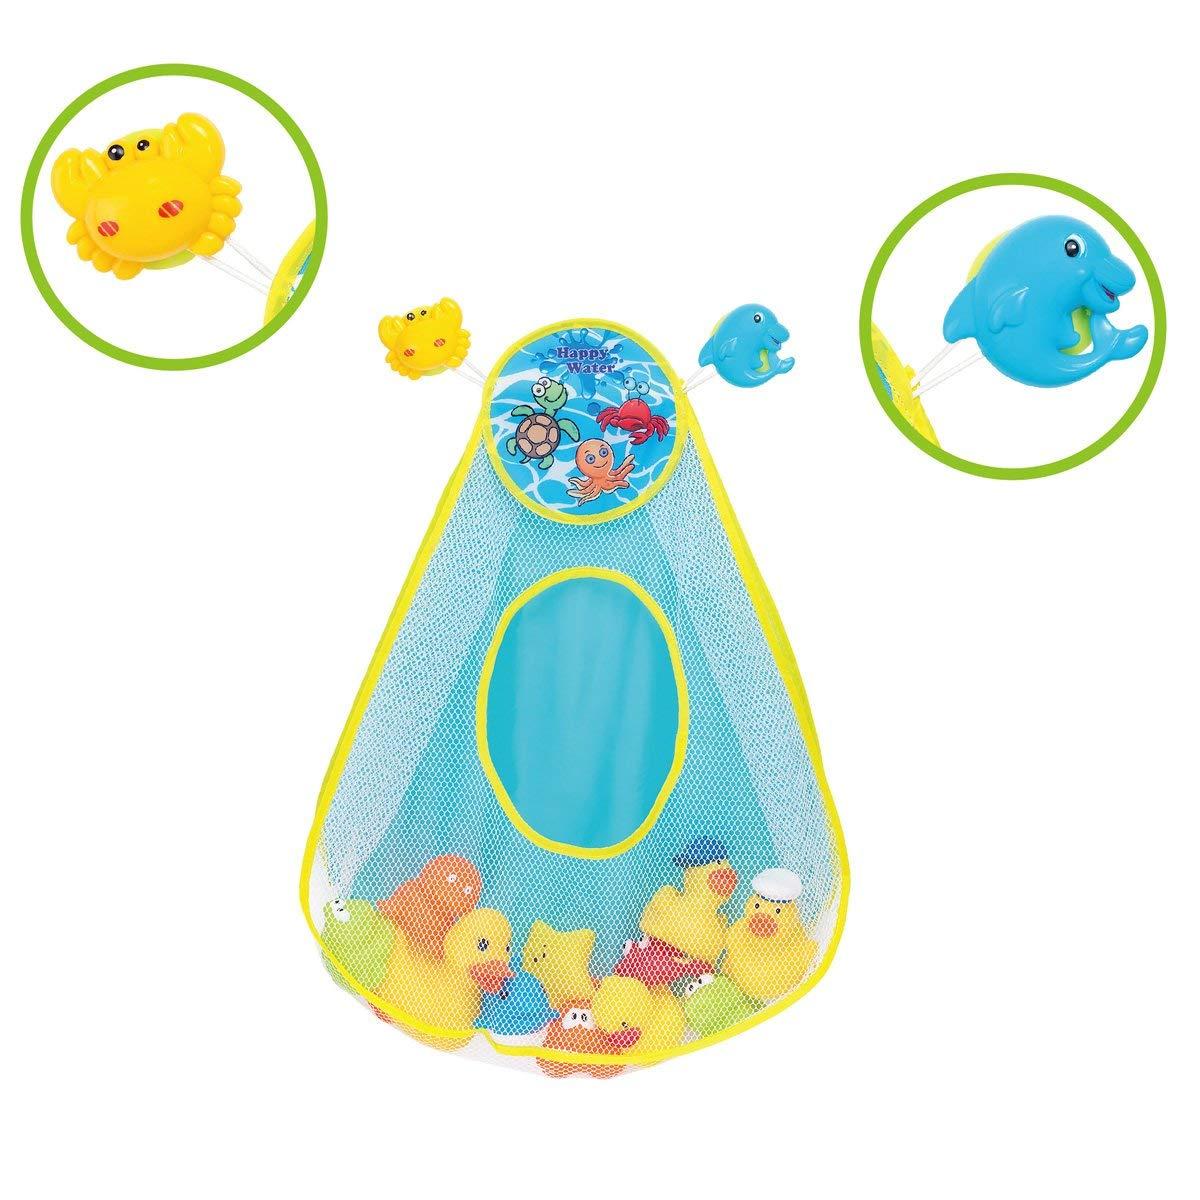 CatchStar Bath Toy Organizer Quick Dry Net Toy Storage Durable Holder for Baby Bathroom Bathtub Toys